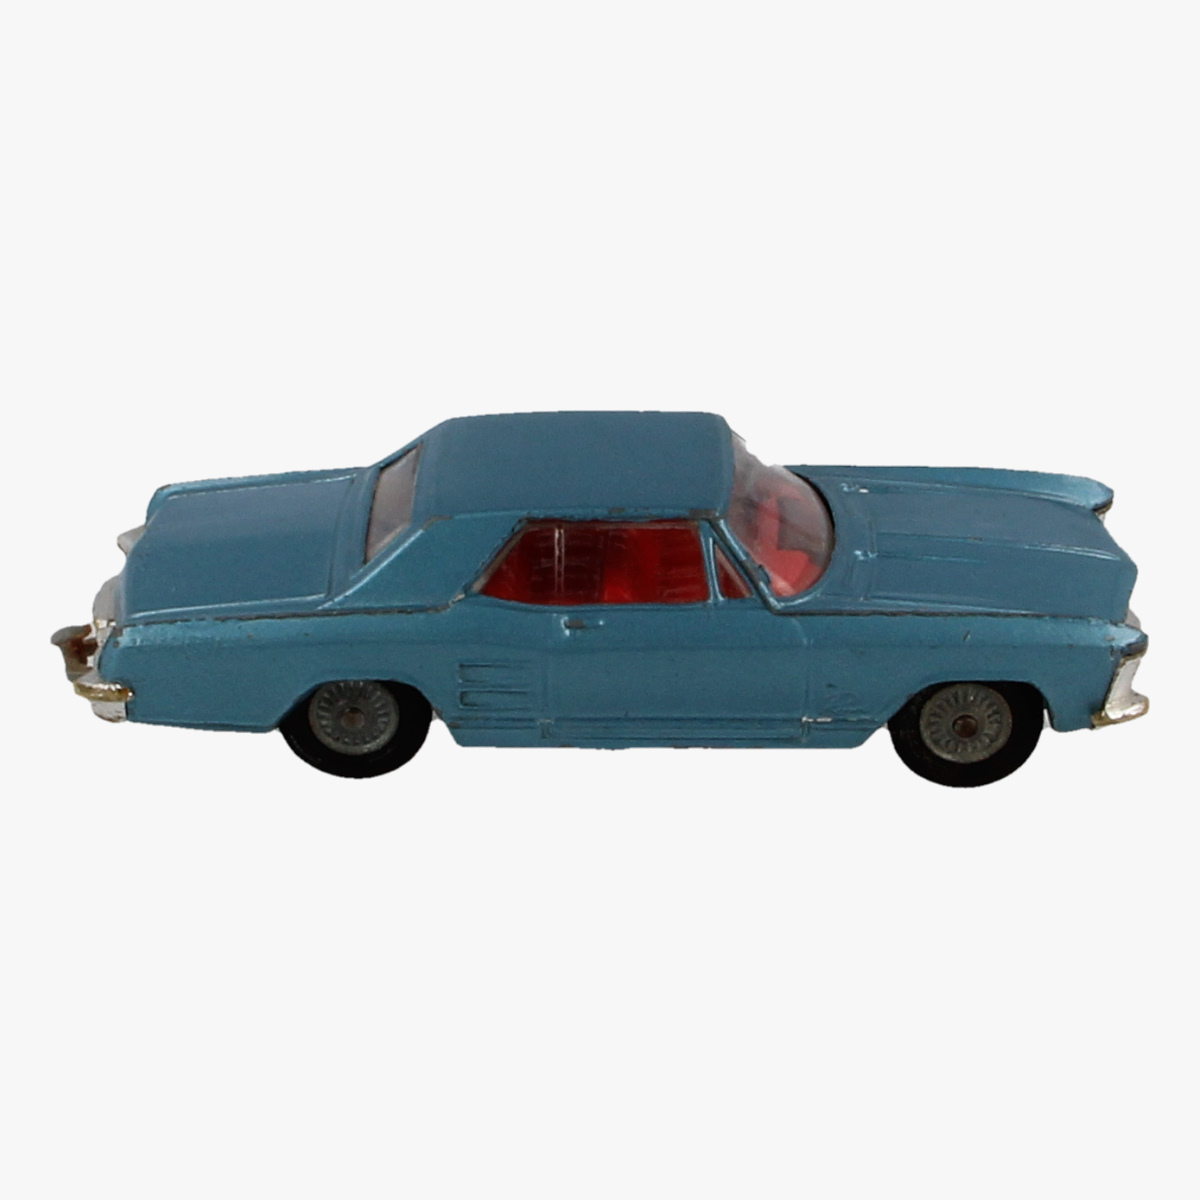 Afbeeldingen van Corgi Toys. Buick Riviera. Nr.245